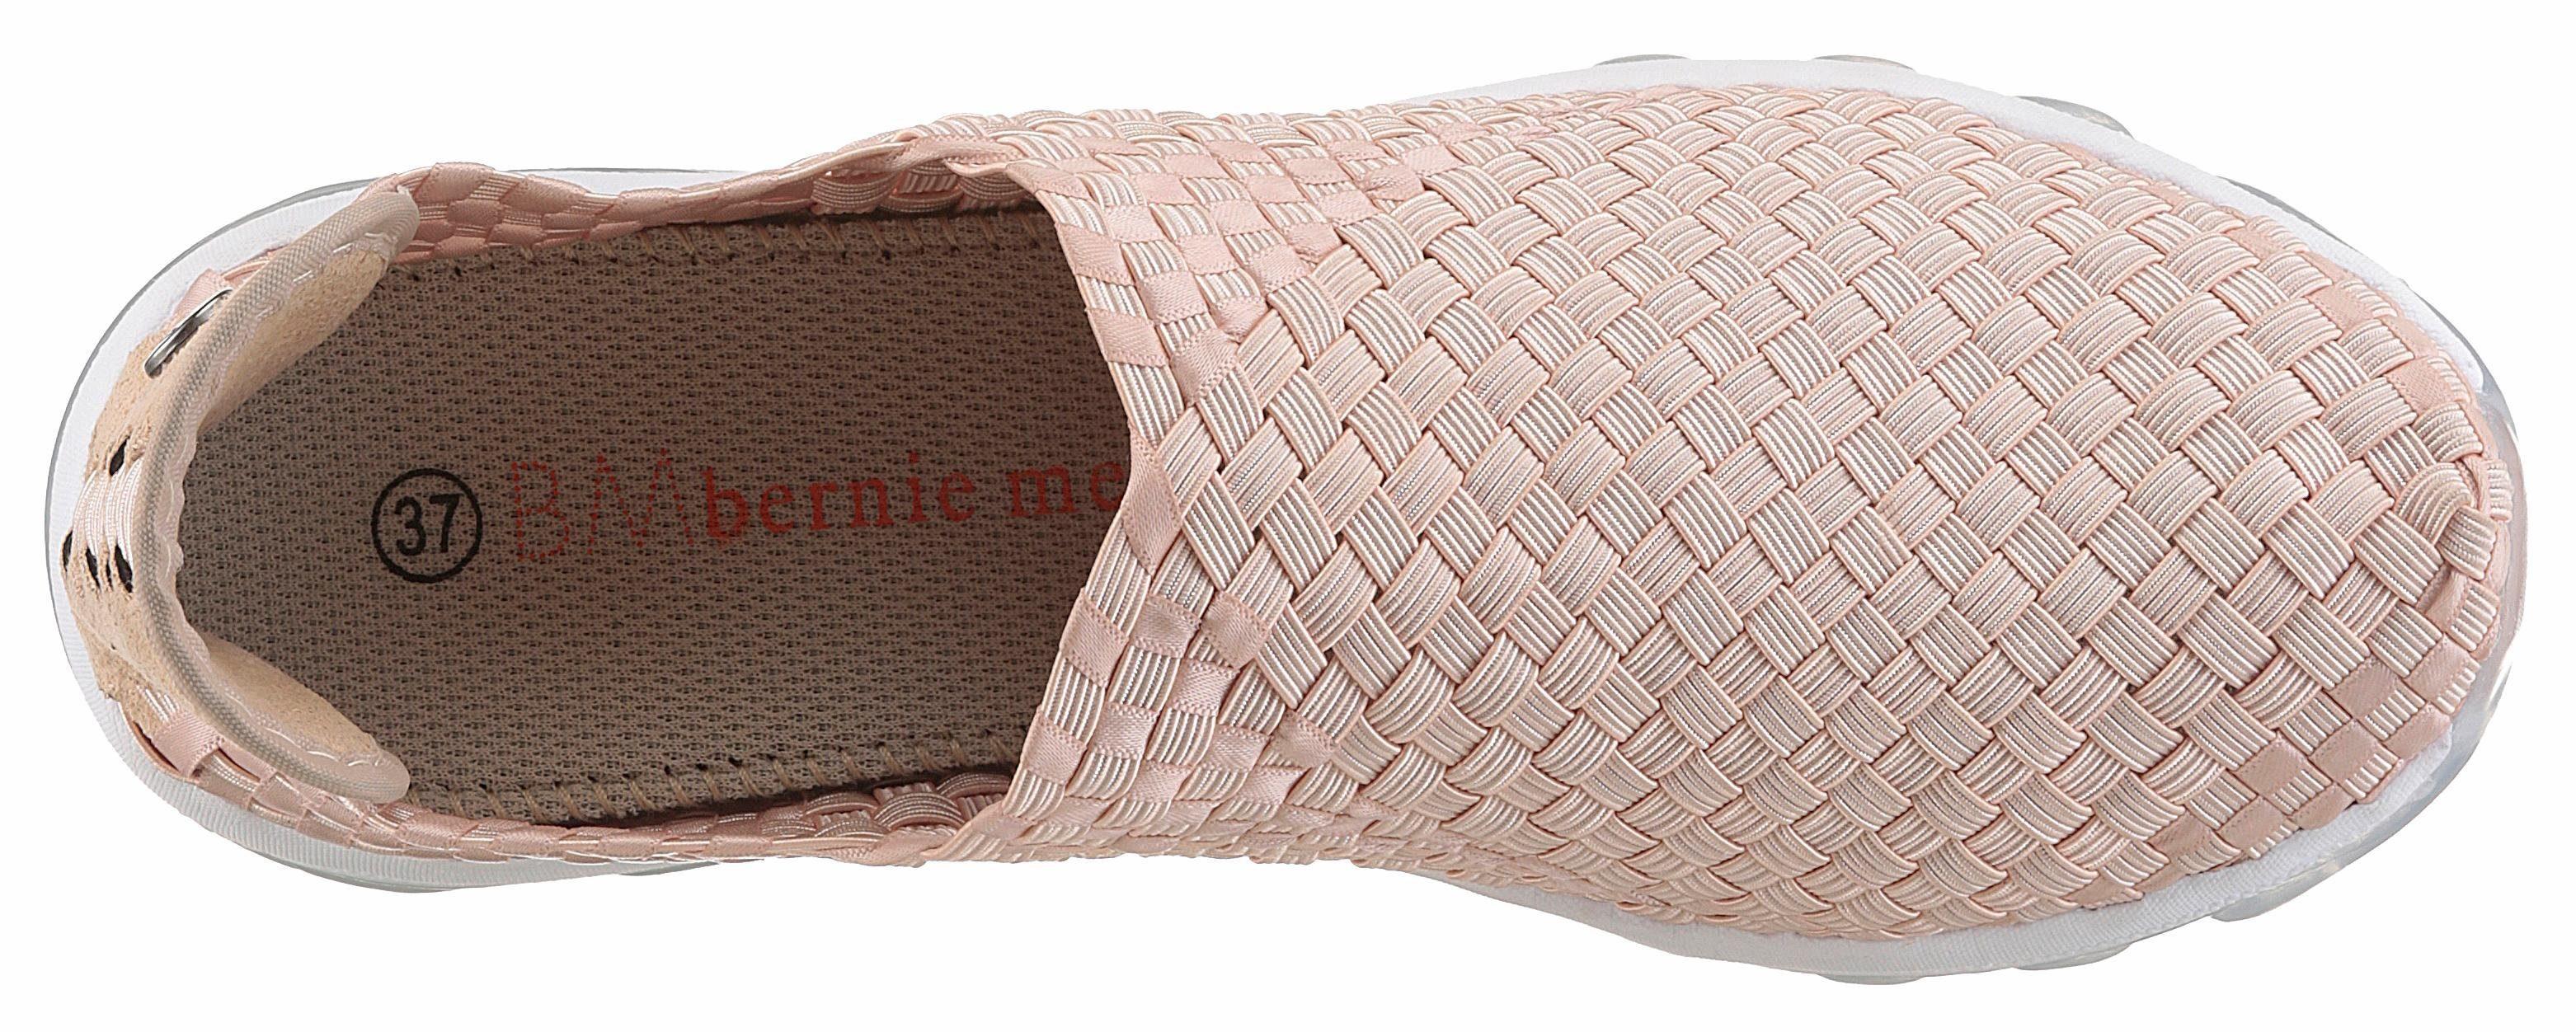 BERNIE MEV Gummies Gem Slipper, aus Stretchmaterial online kaufen  rosé